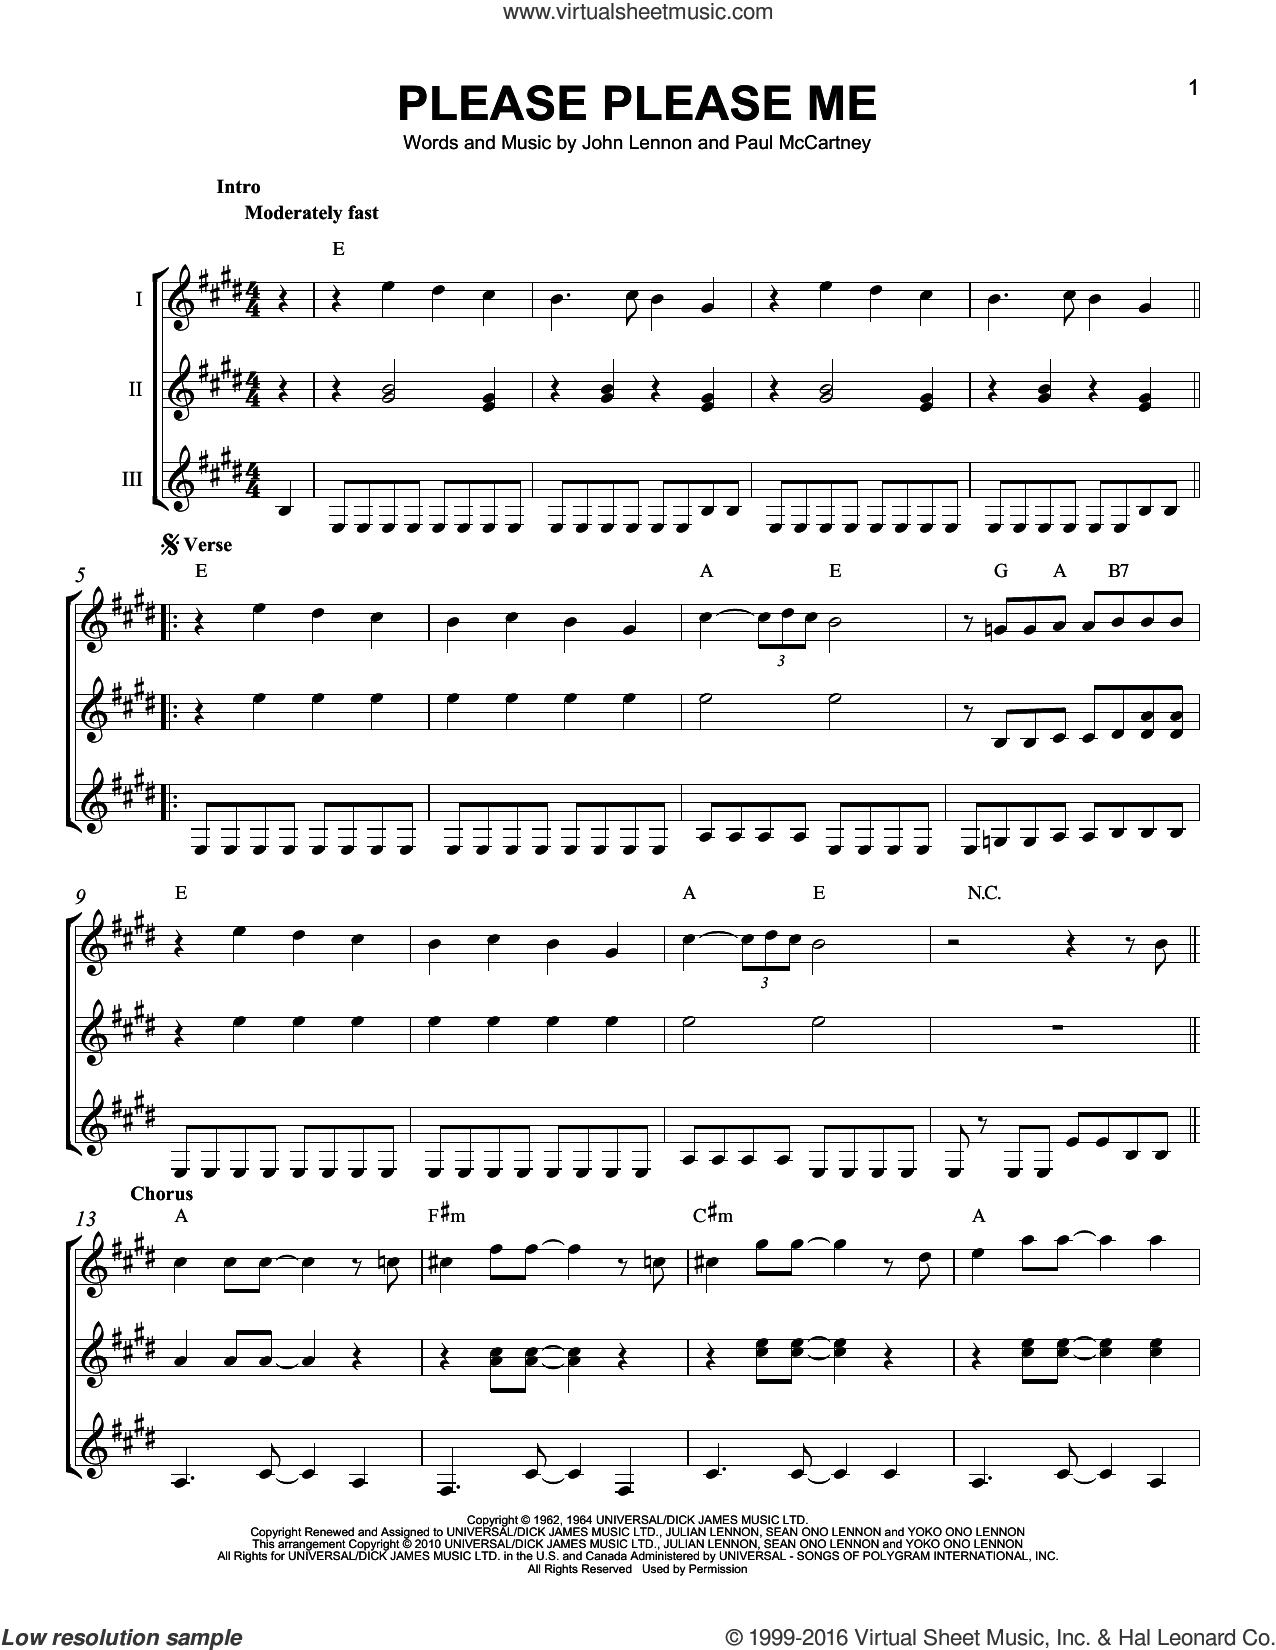 Please Please Me sheet music for guitar ensemble by The Beatles, John Lennon and Paul McCartney, intermediate skill level